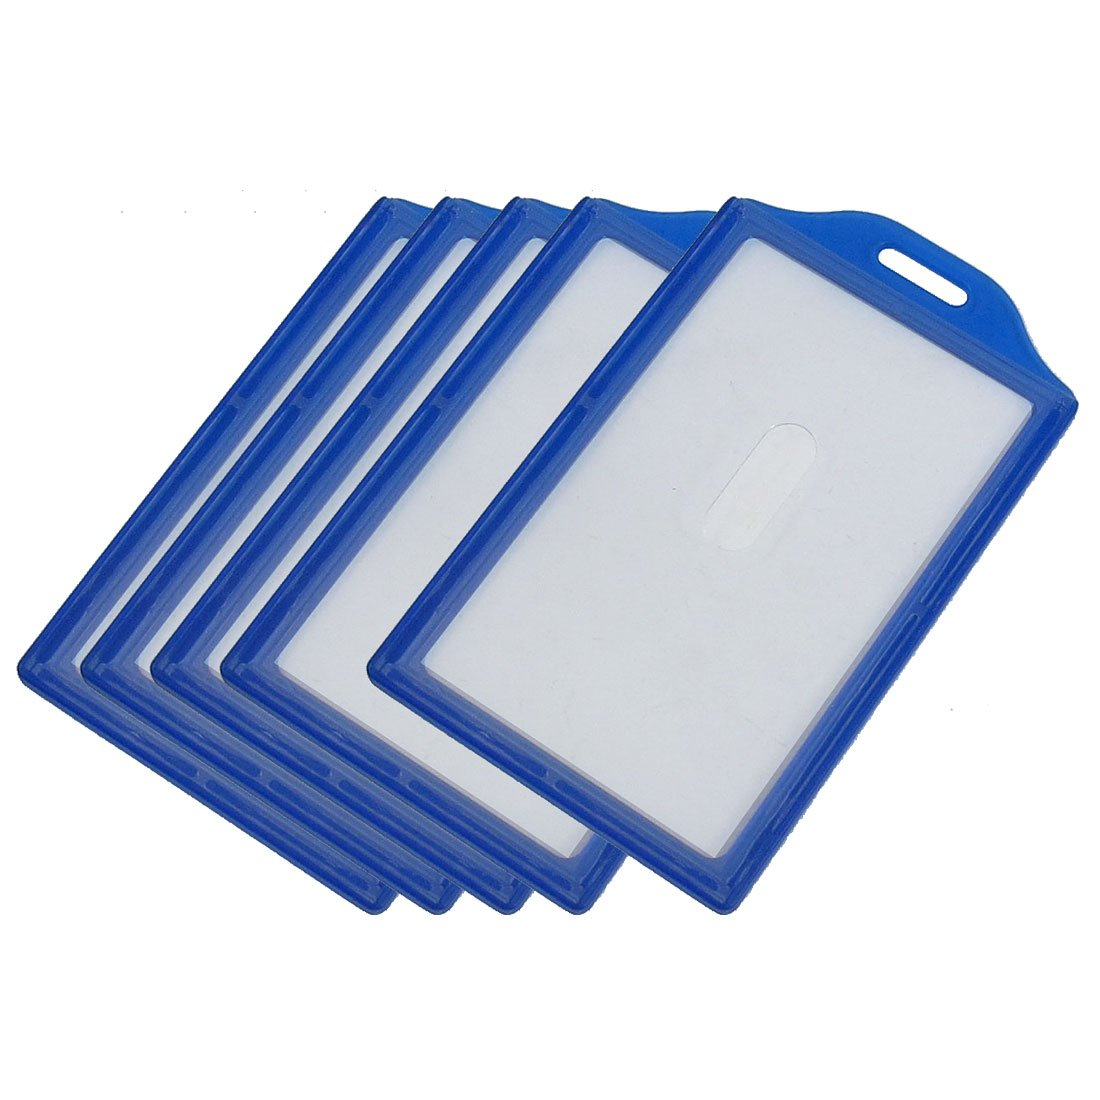 5X Vertical Business ID Badge Card Holders, 5 Pcs, Clear Blue W2N9